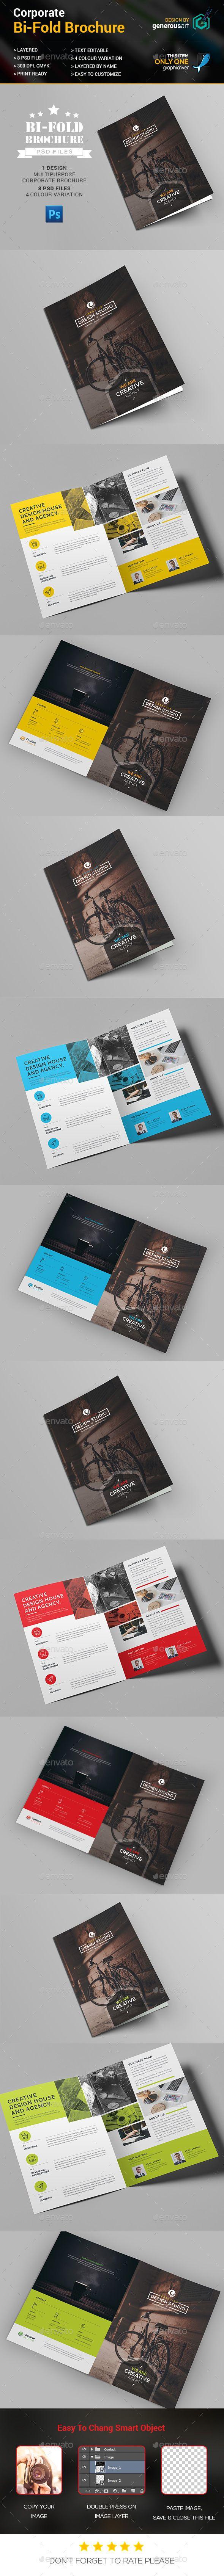 The 25 best folded business cards ideas on pinterest pop up bi fold business brochure magicingreecefo Gallery